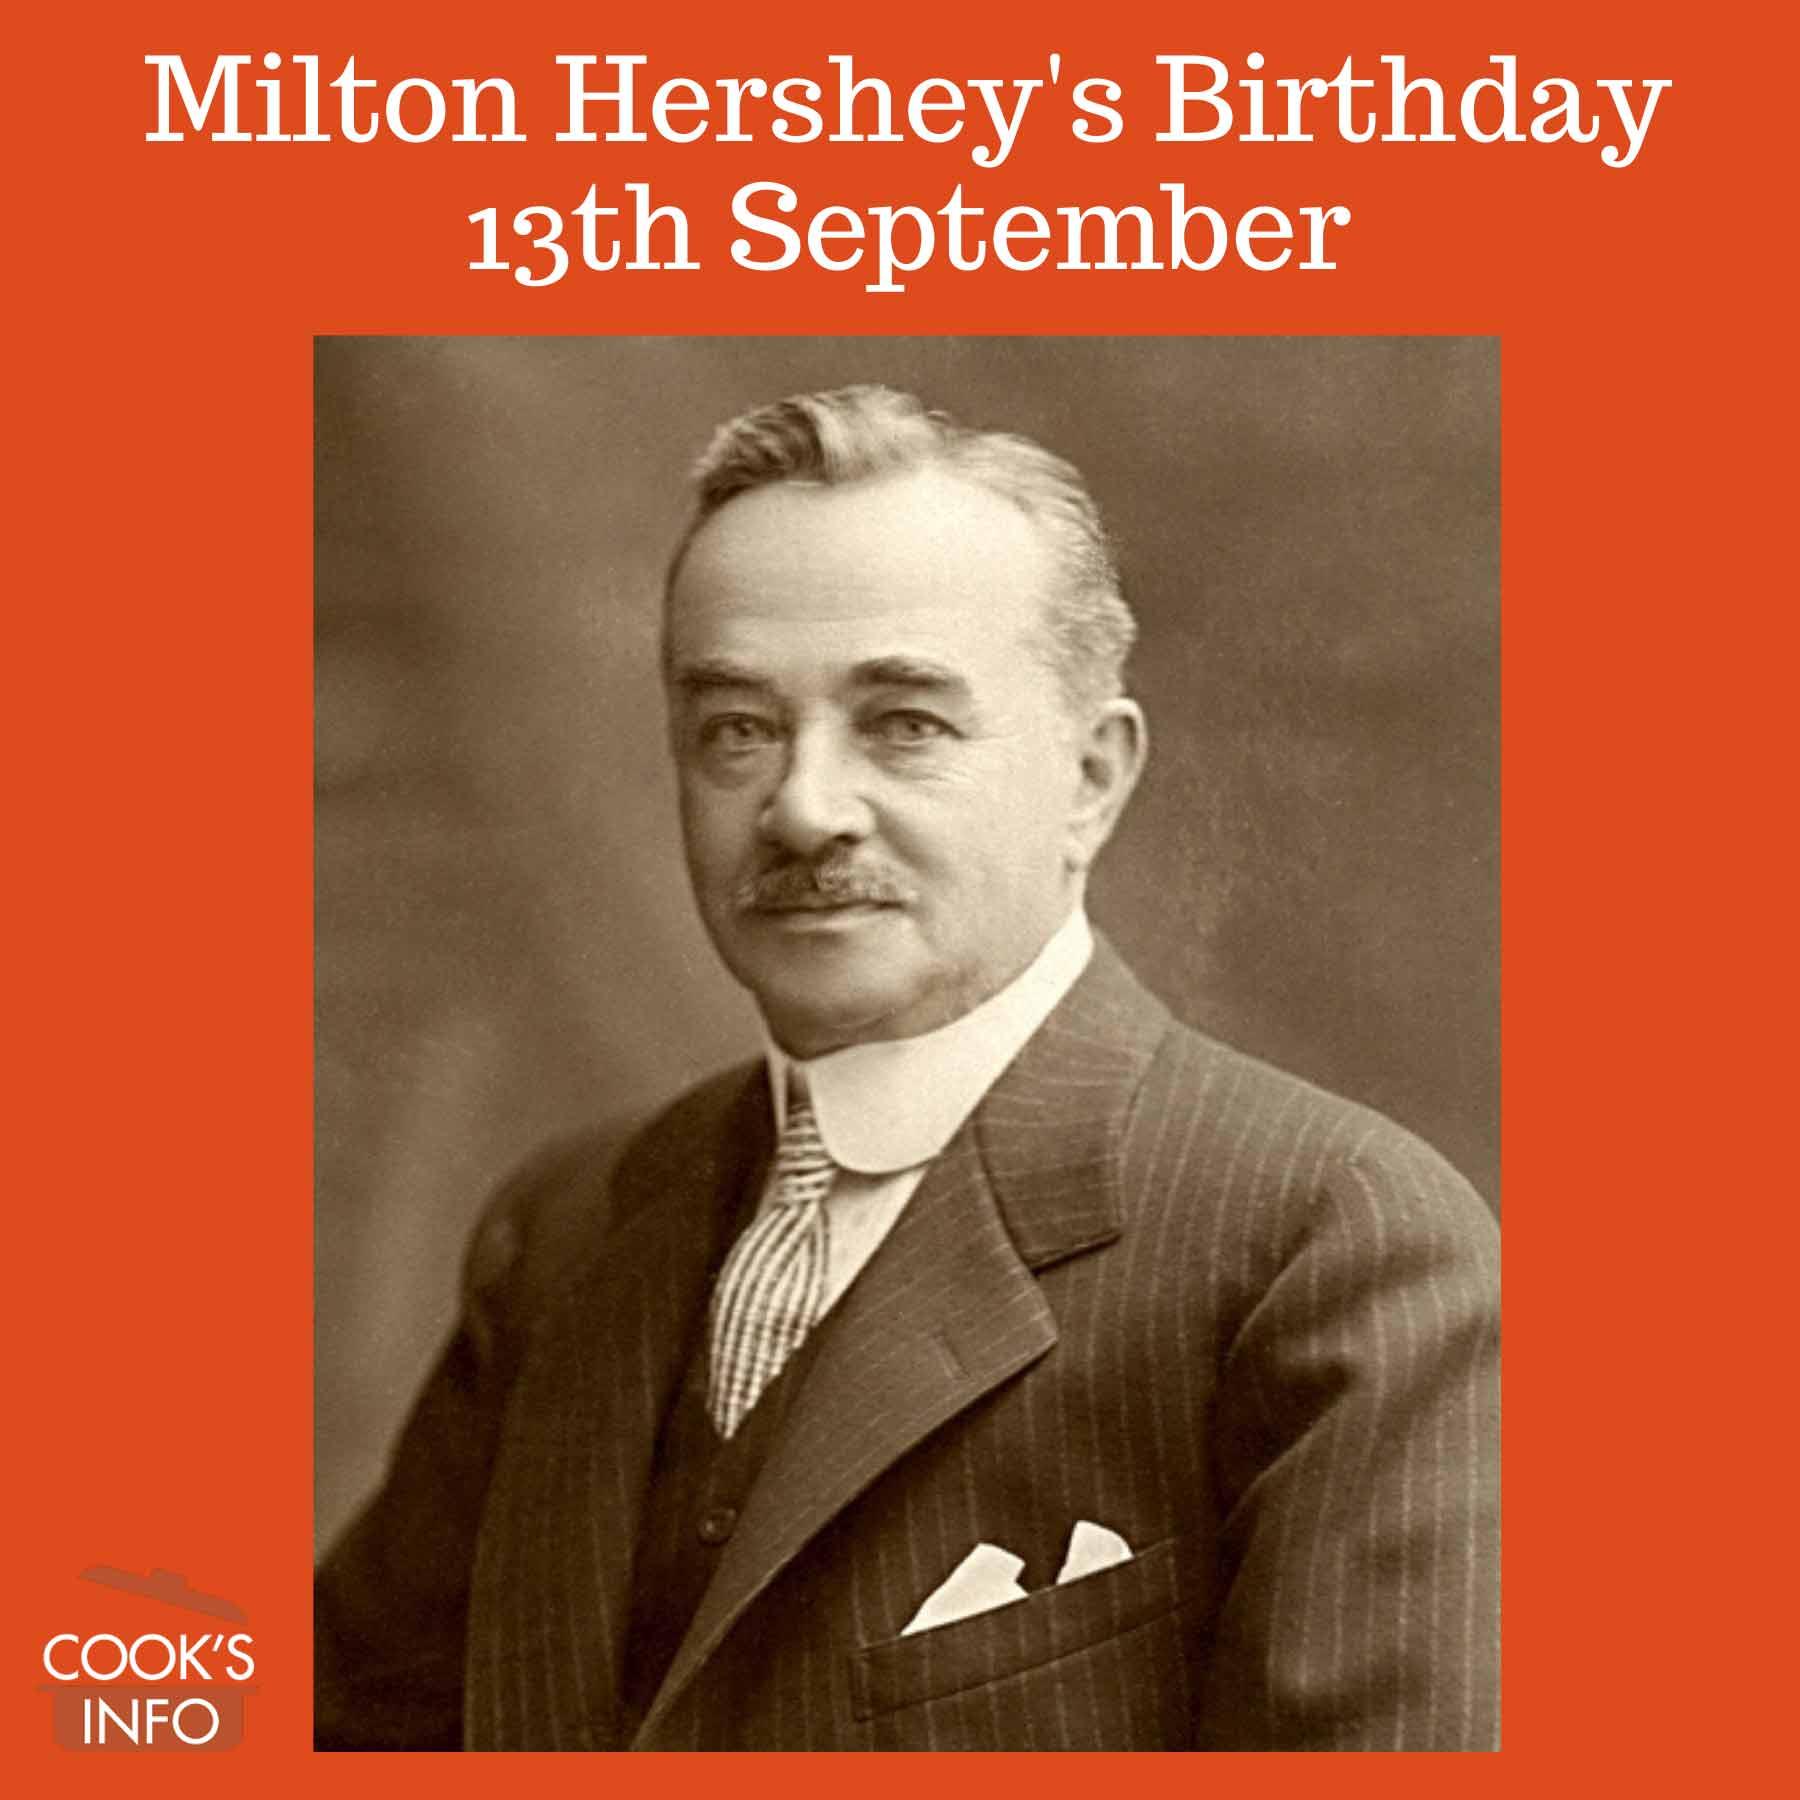 Milton Snavely Hershey 1910